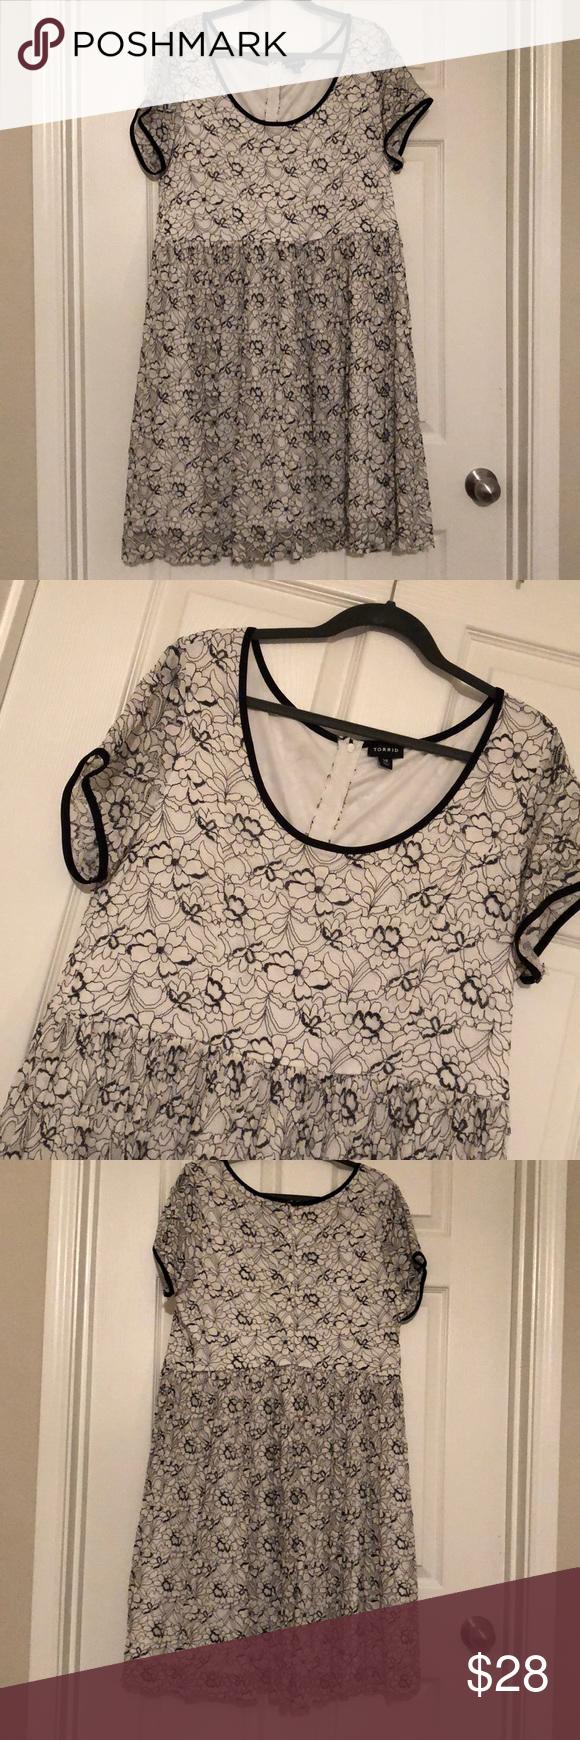 Lace dress torrid  Torrid white u black lace dress  My Posh Picks  Pinterest  Torrid